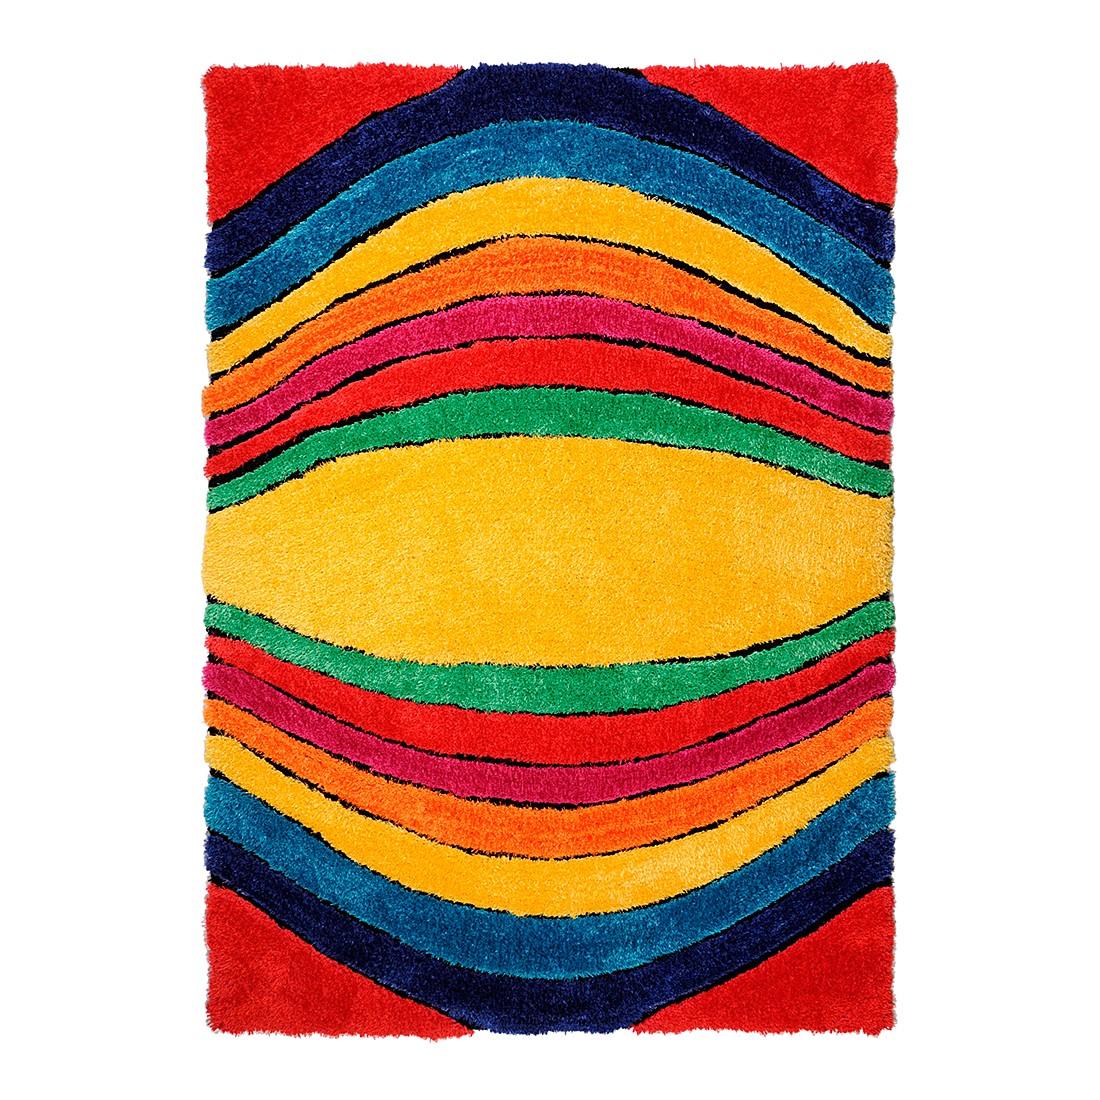 Home 24 - Tapis soft funky - multicolore - 140 cm x 200 cm, tom tailor